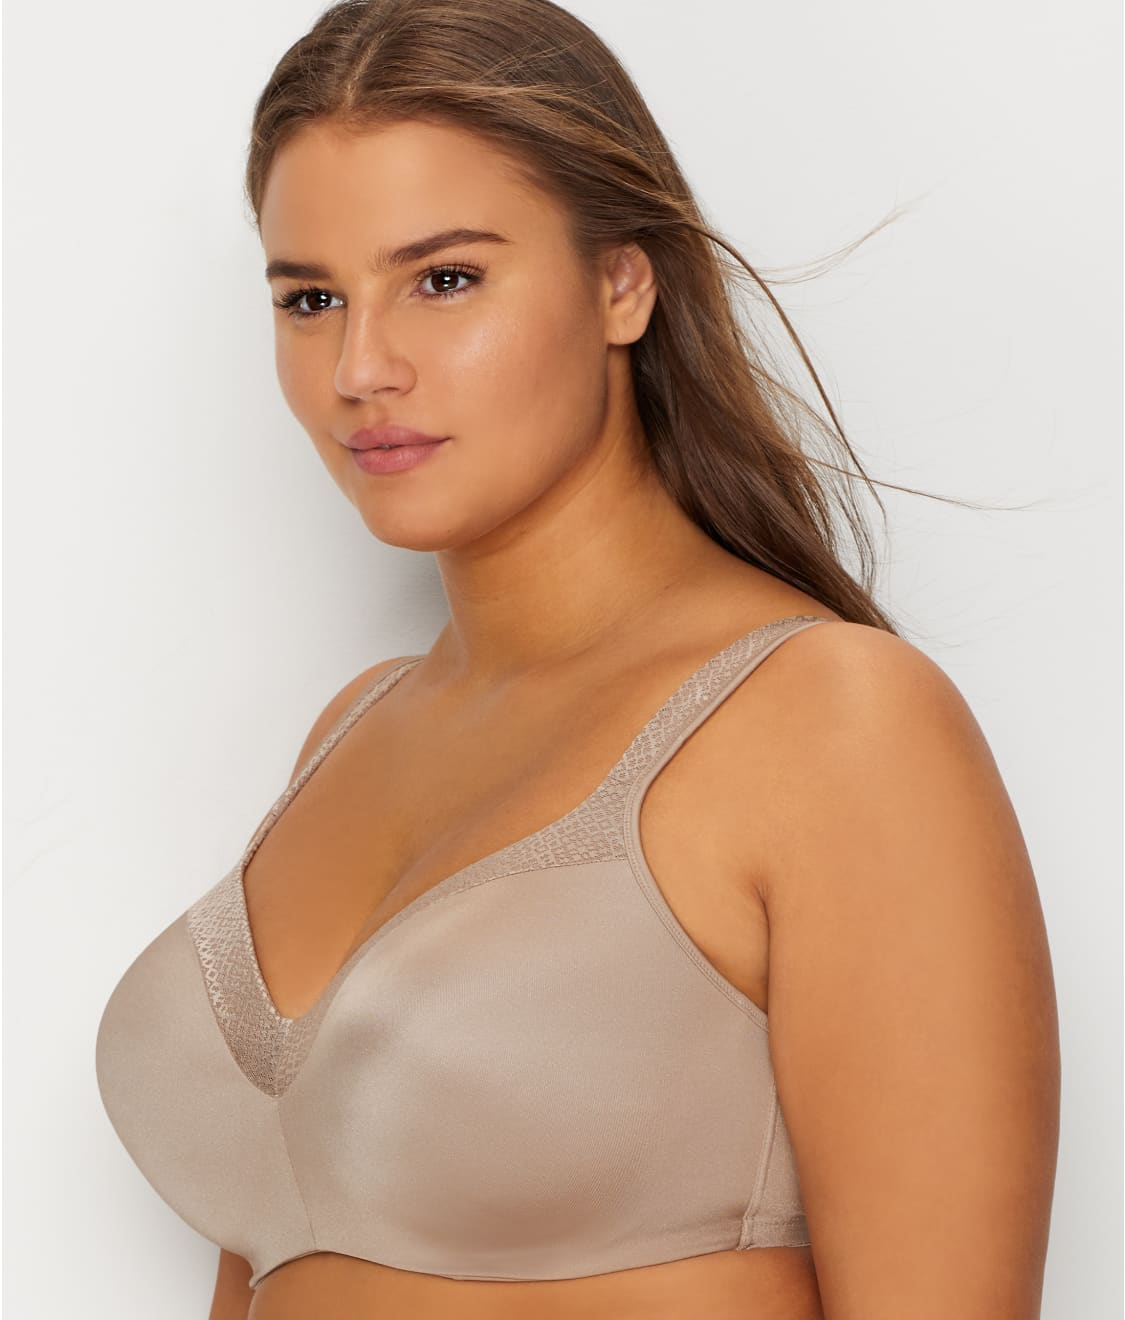 39d085f09ecdb Playtex Love My Curves Amazing Shape Bra